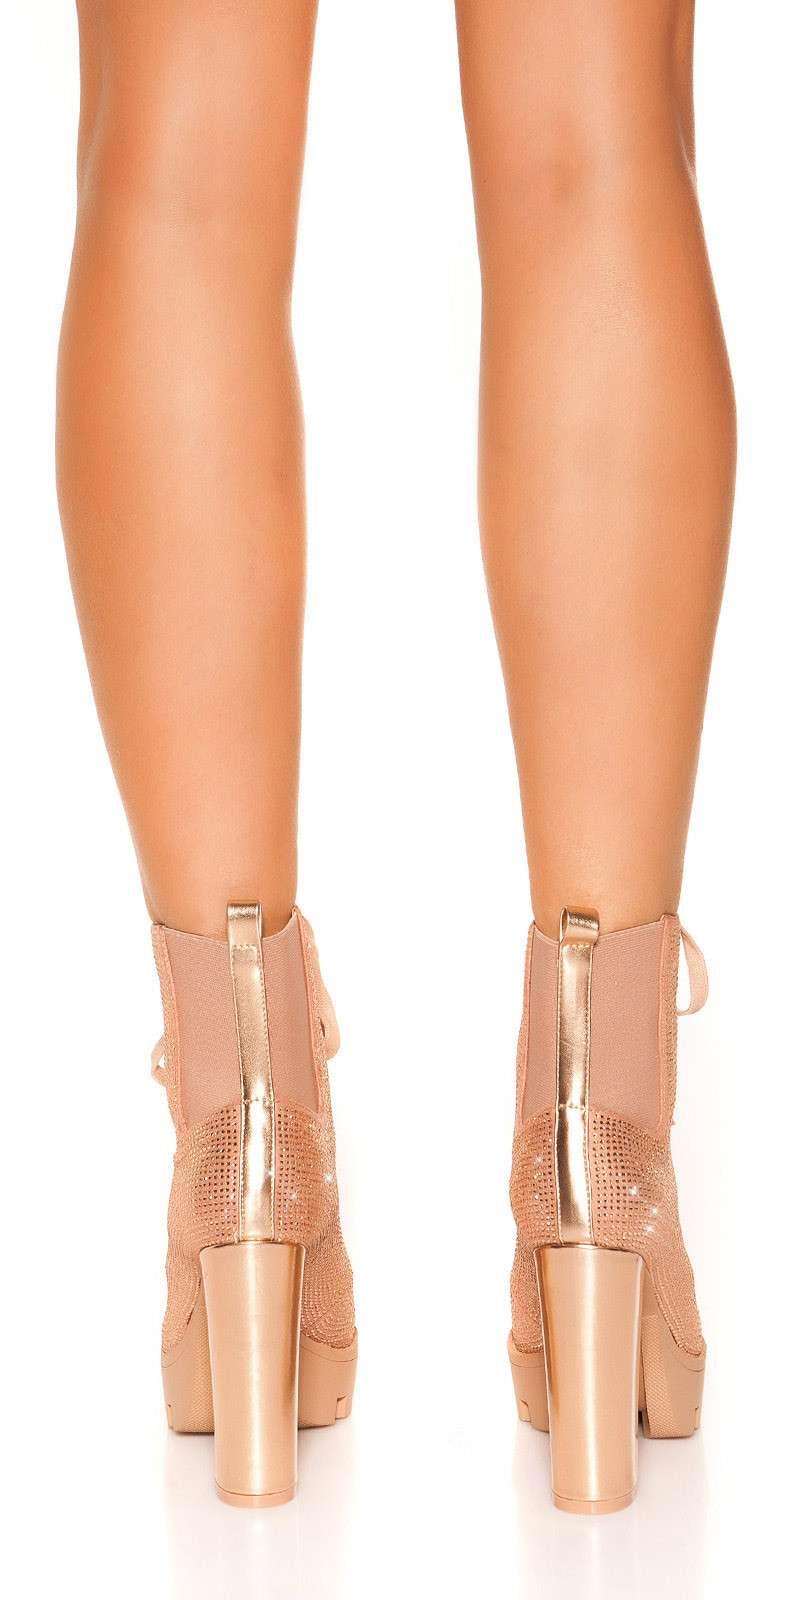 Bottes High Heels